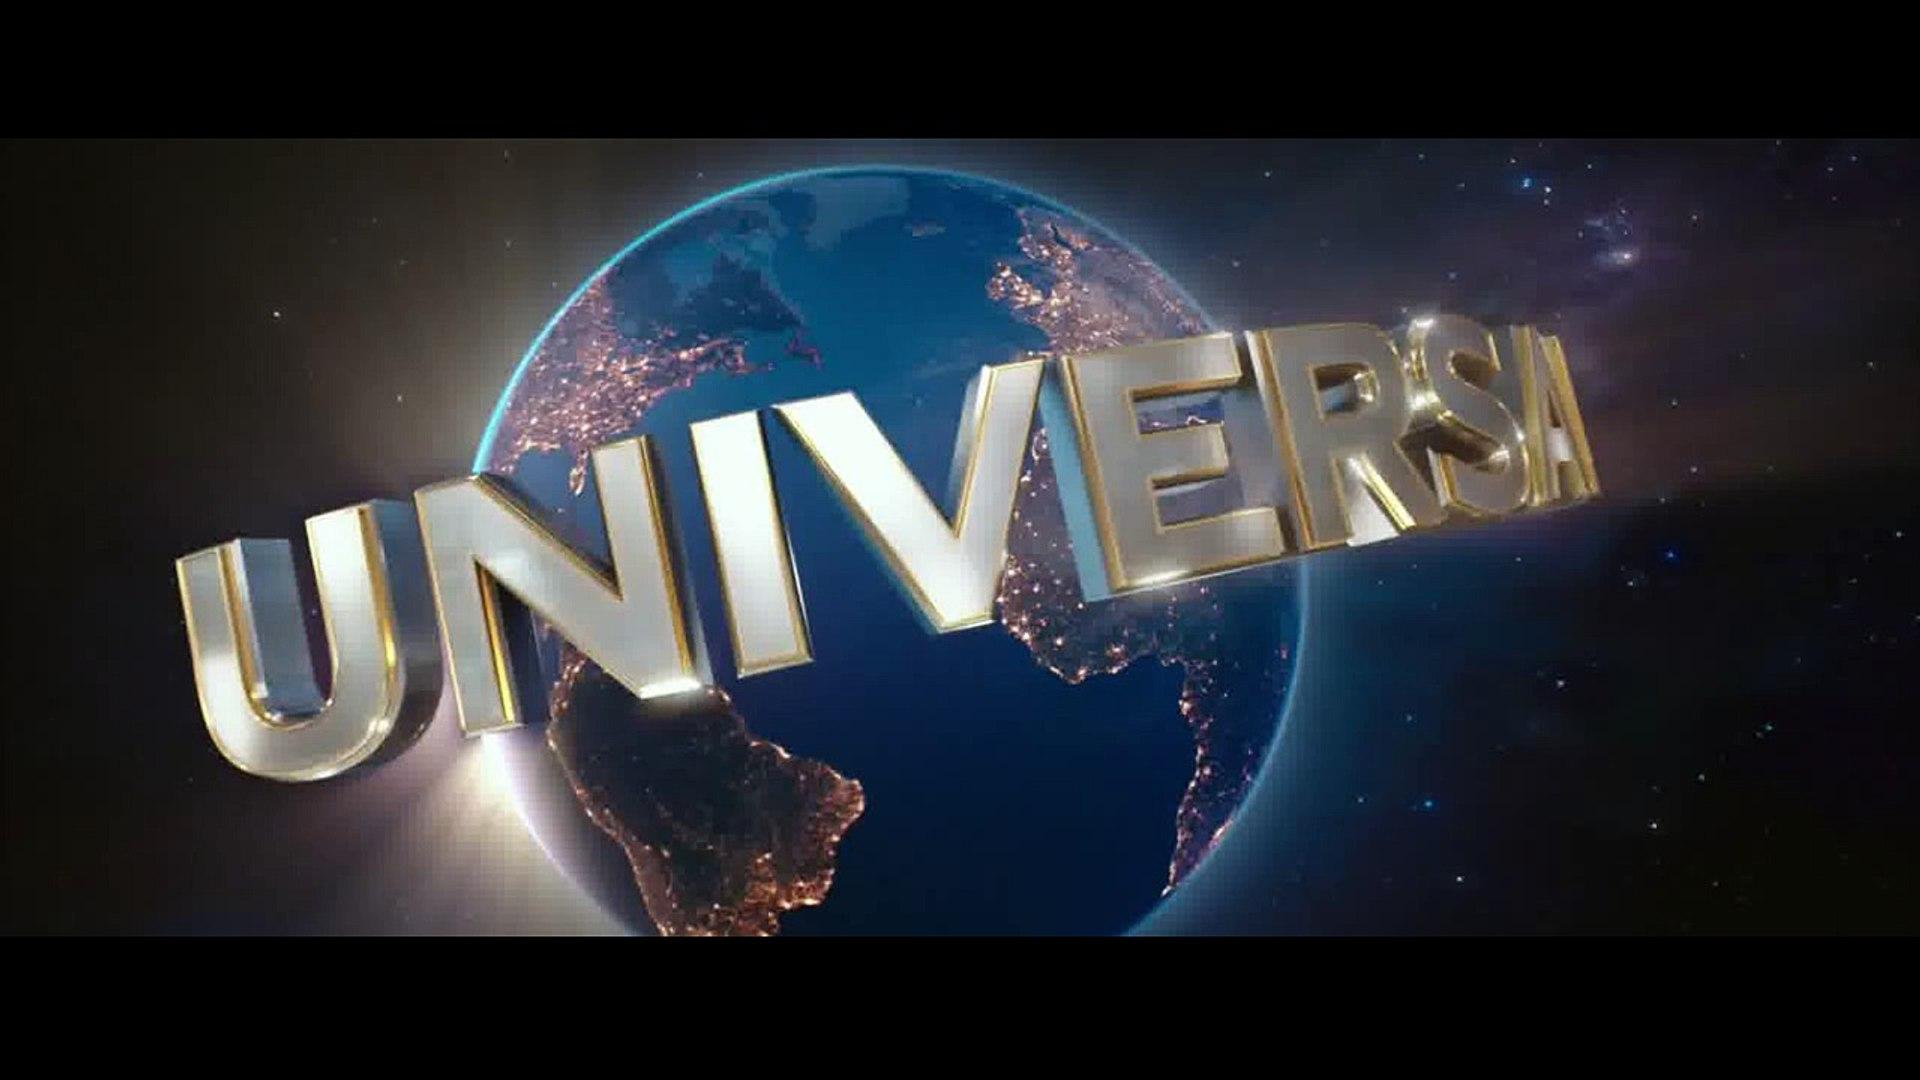 Bobby G. Can't Swim Film Complet VF 2016 En Ligne HD Partie 7/10